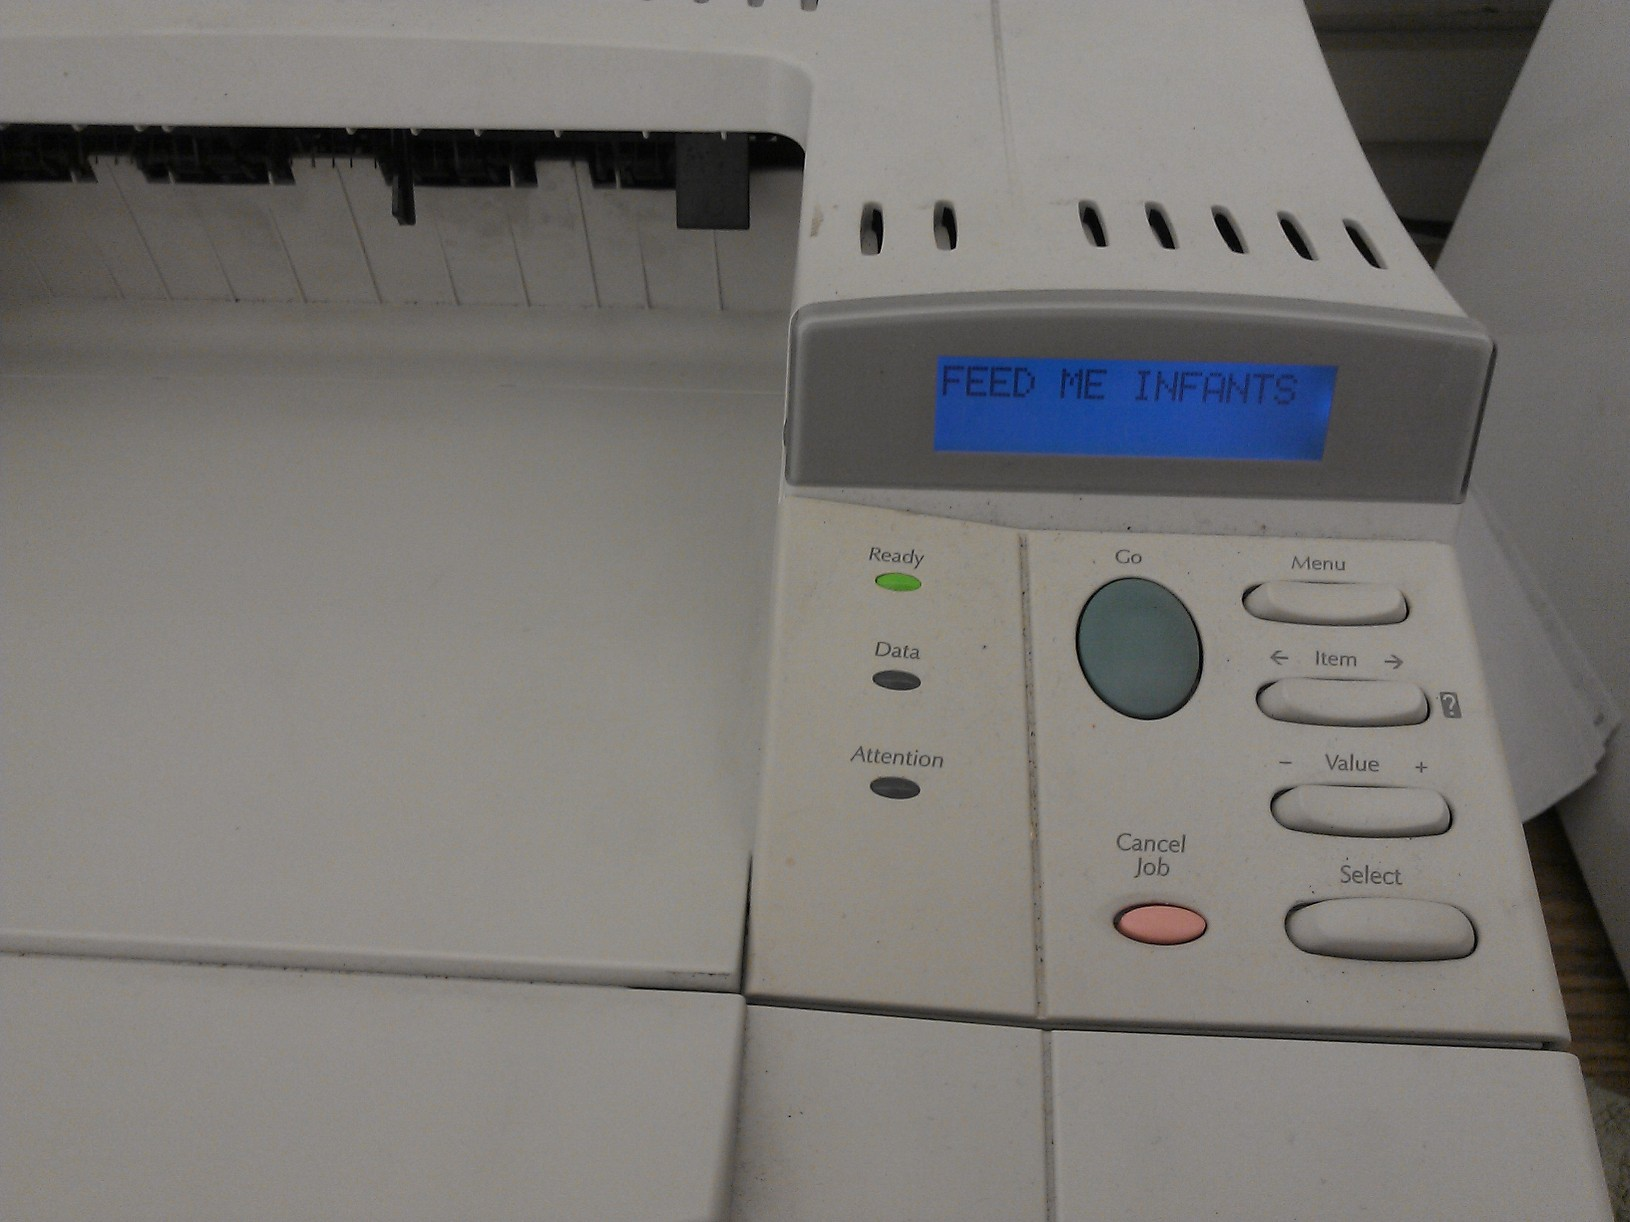 Hack the printer to say something funny.  Source: Reddit user tolomont via Imgur